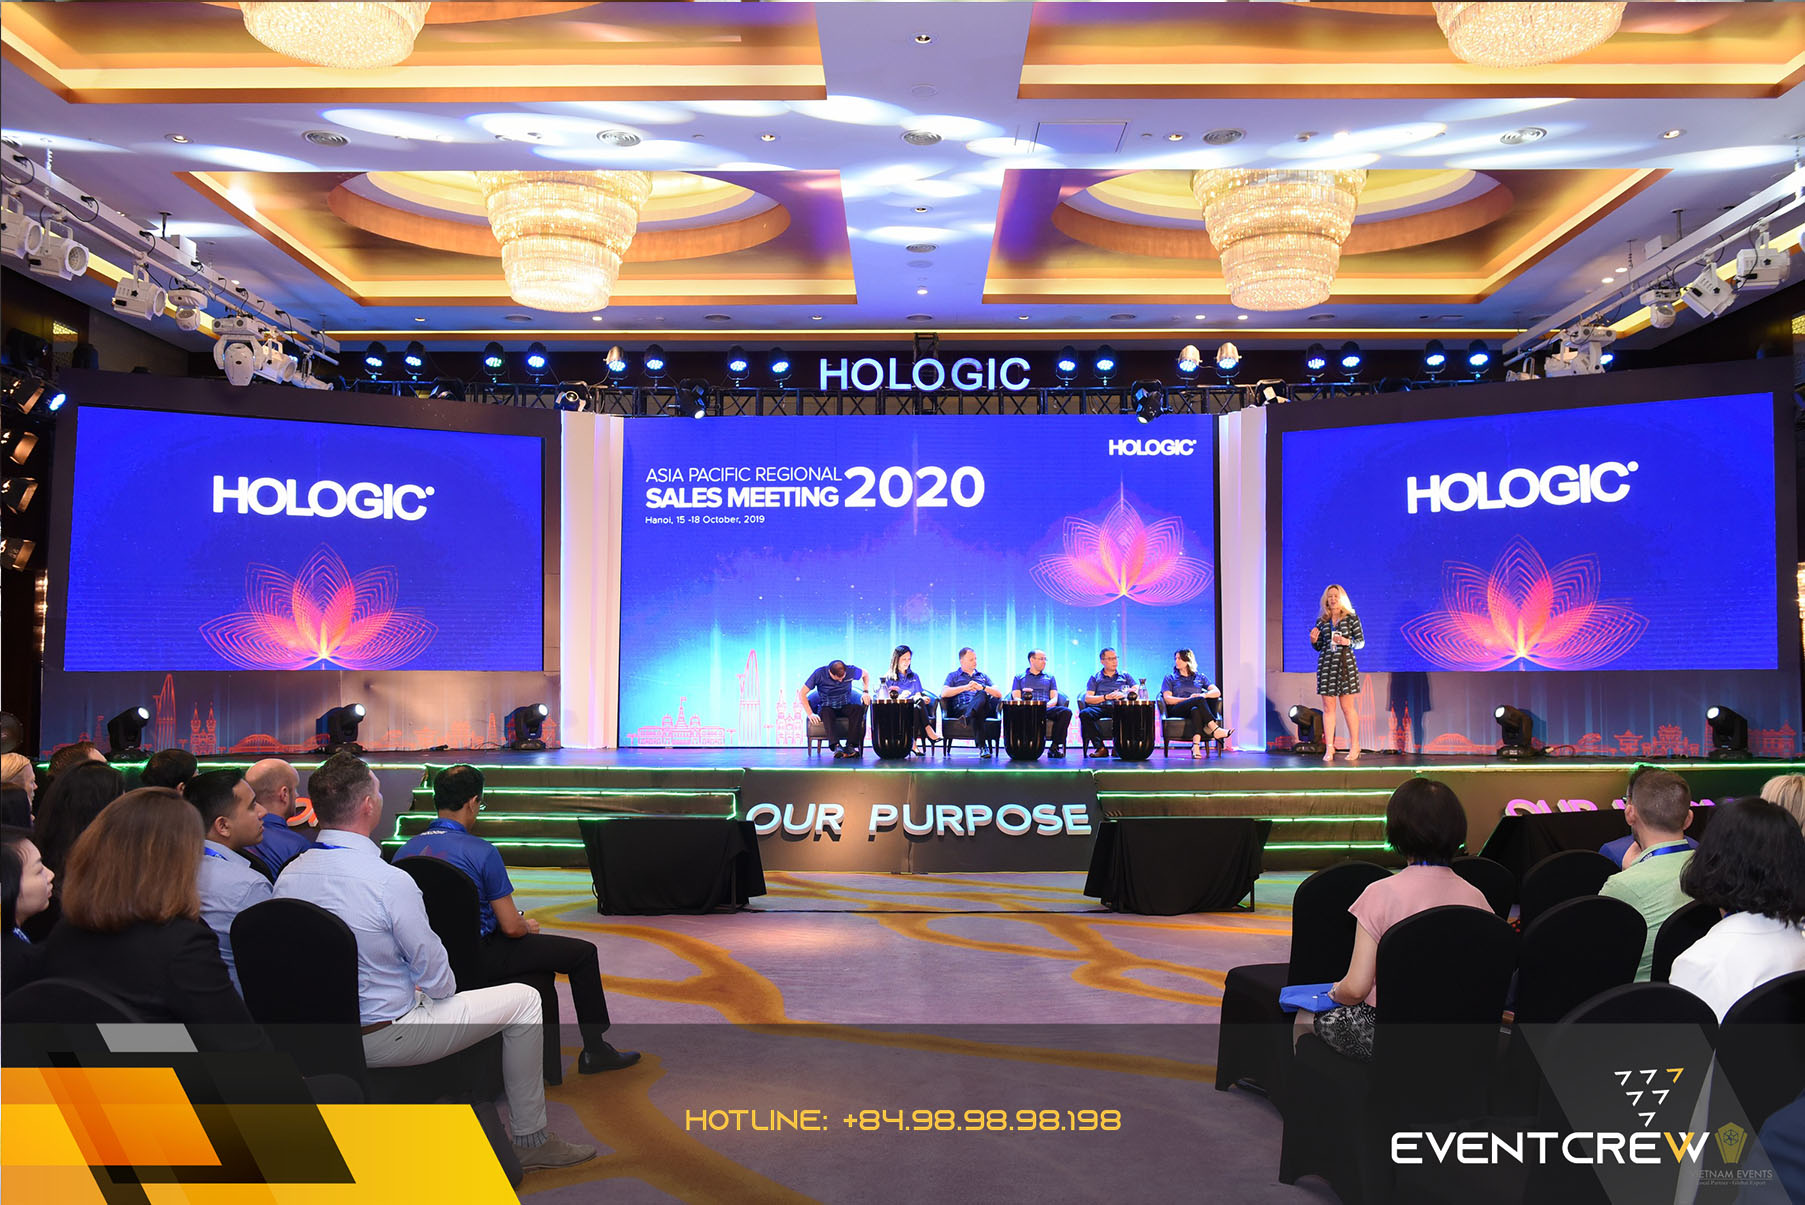 HOLOGIC ASIA PACIFIC REGIONAL SALE MEETINGS